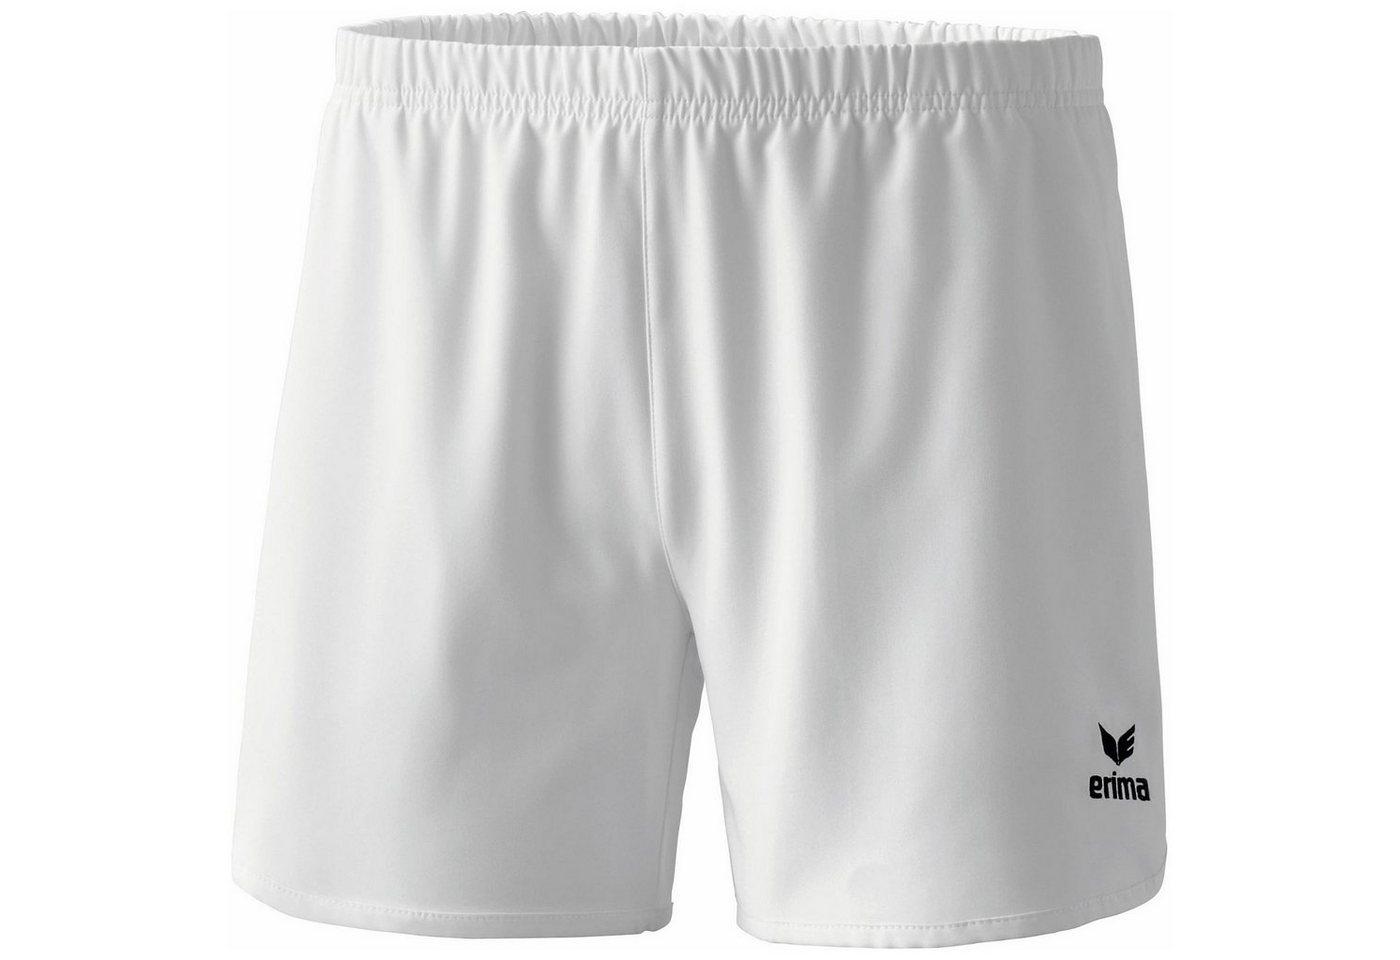 Erima Tennisshorts Damen   Sportbekleidung > Sporthosen > Tennisshorts   Weiß   Ab - Polyester   Erima